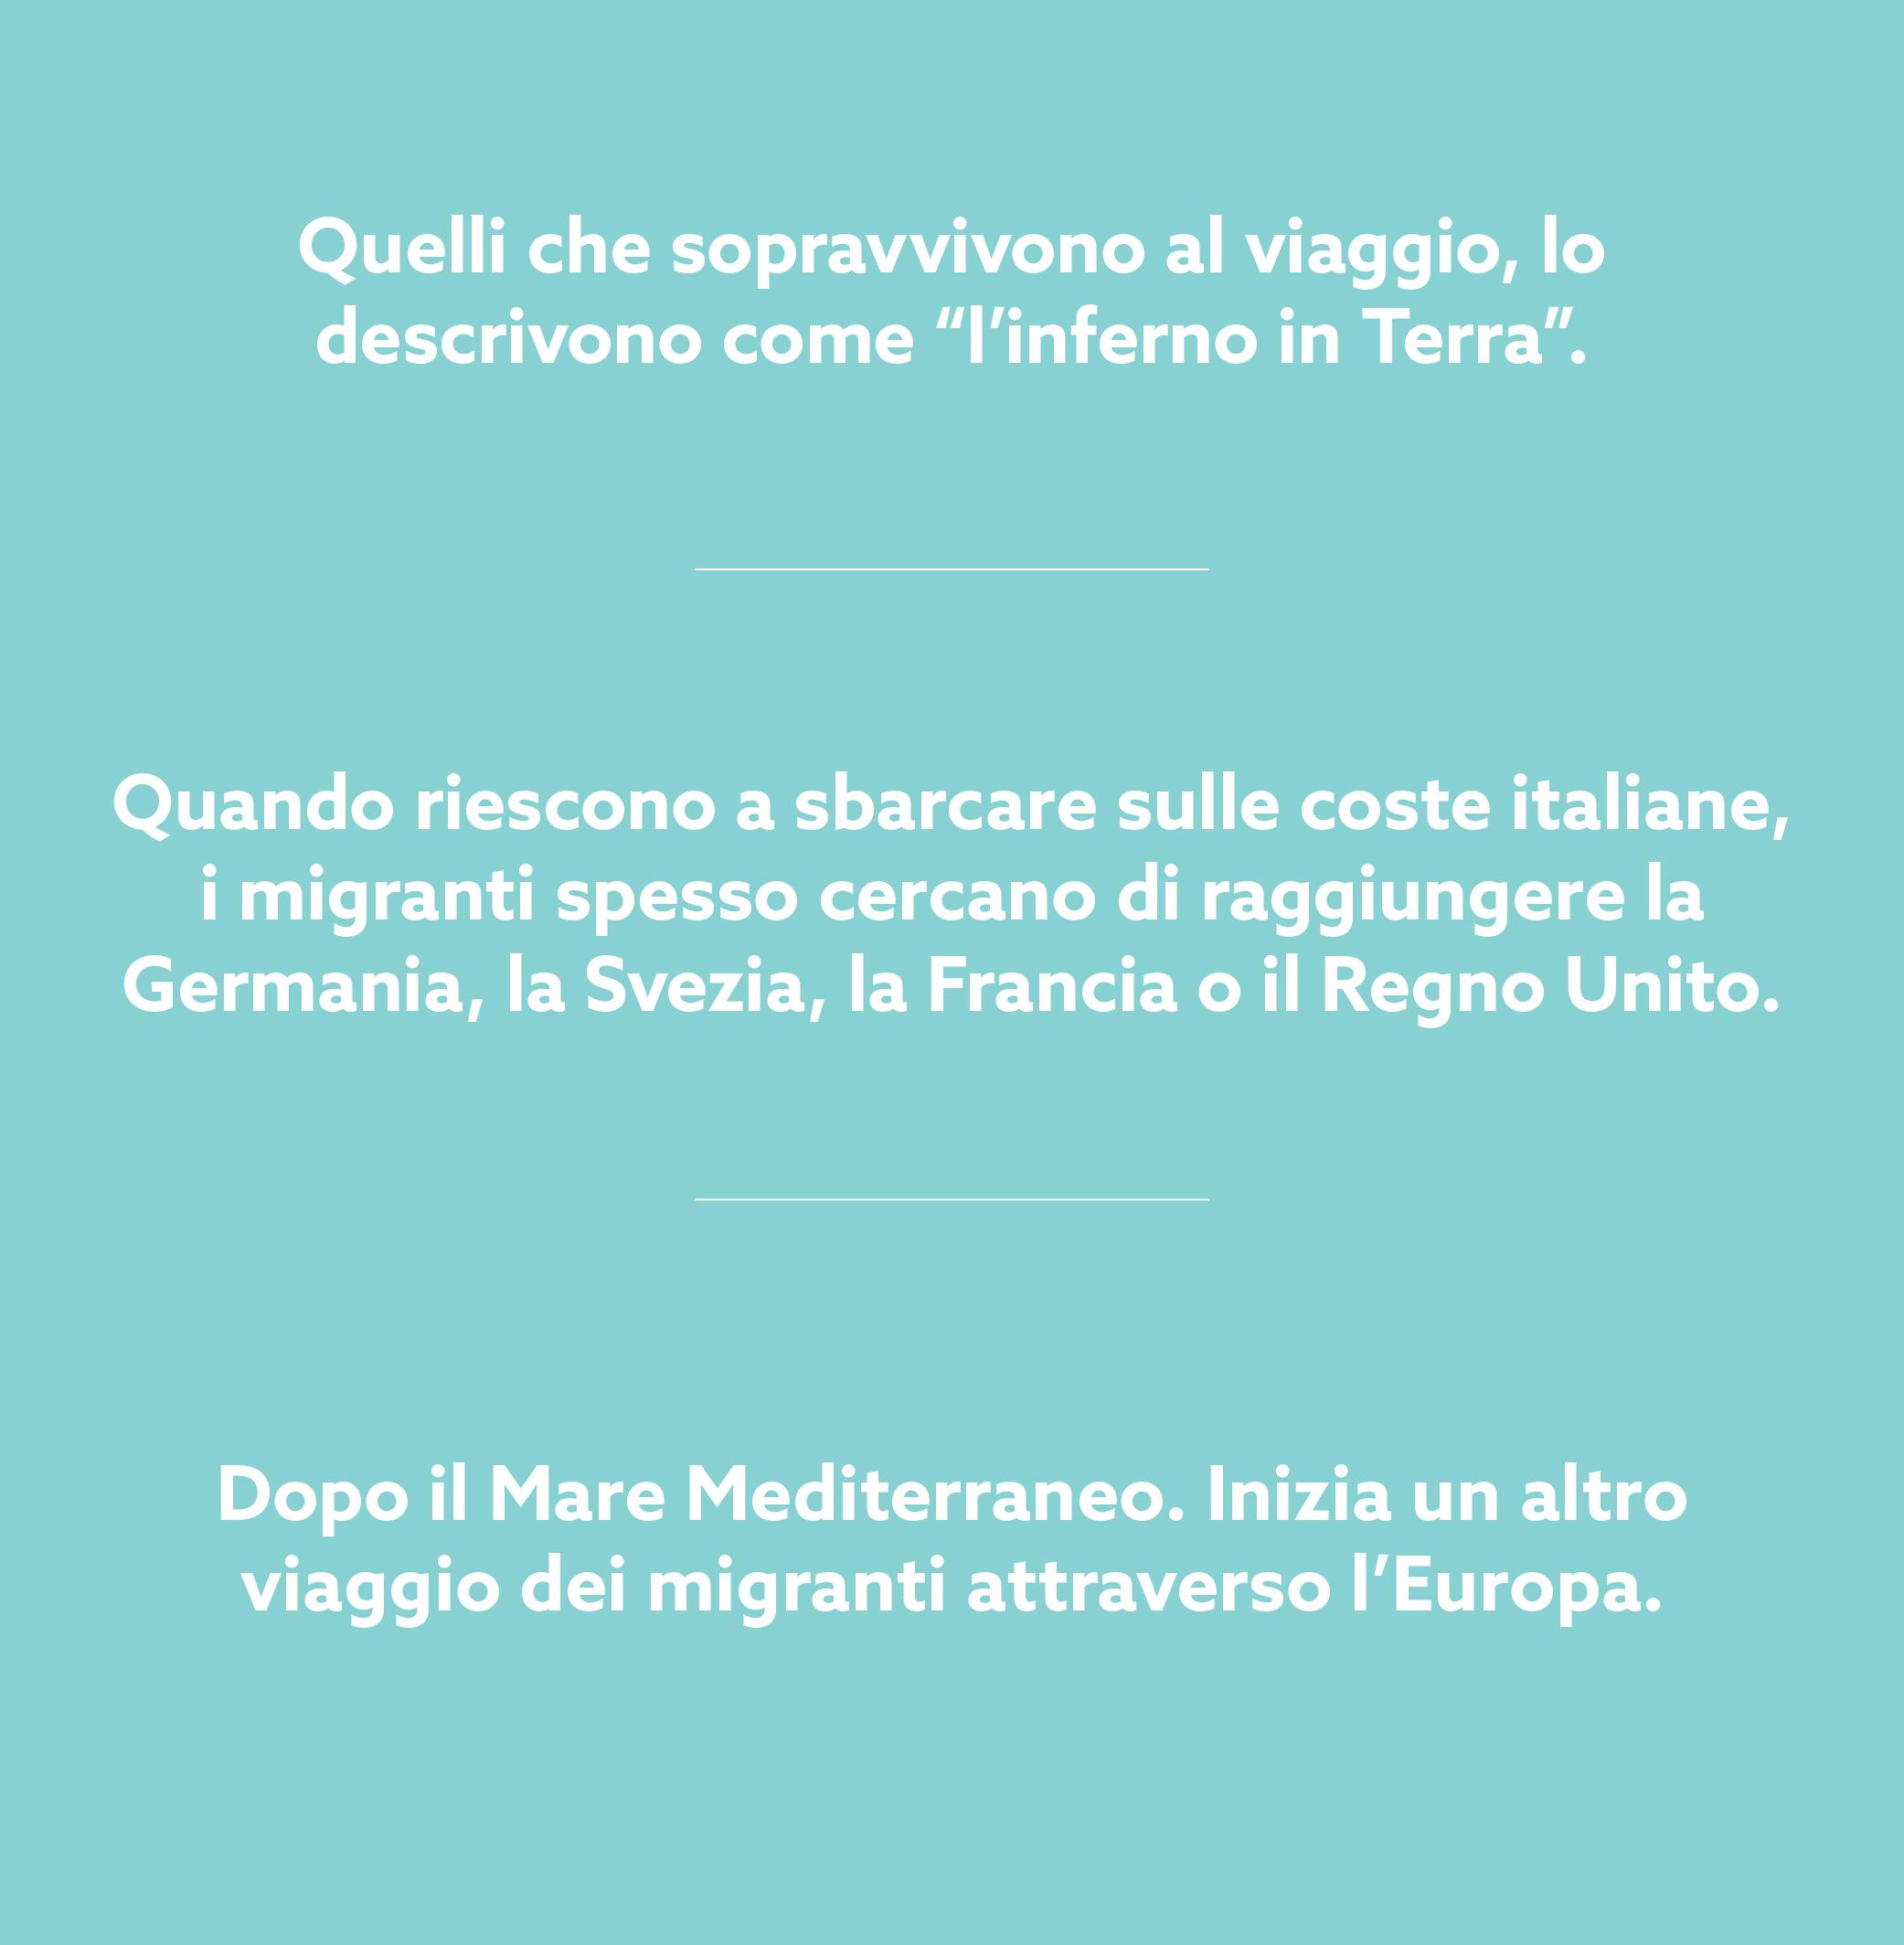 ITALIAN_Migrants_Organized_Part1-12.png